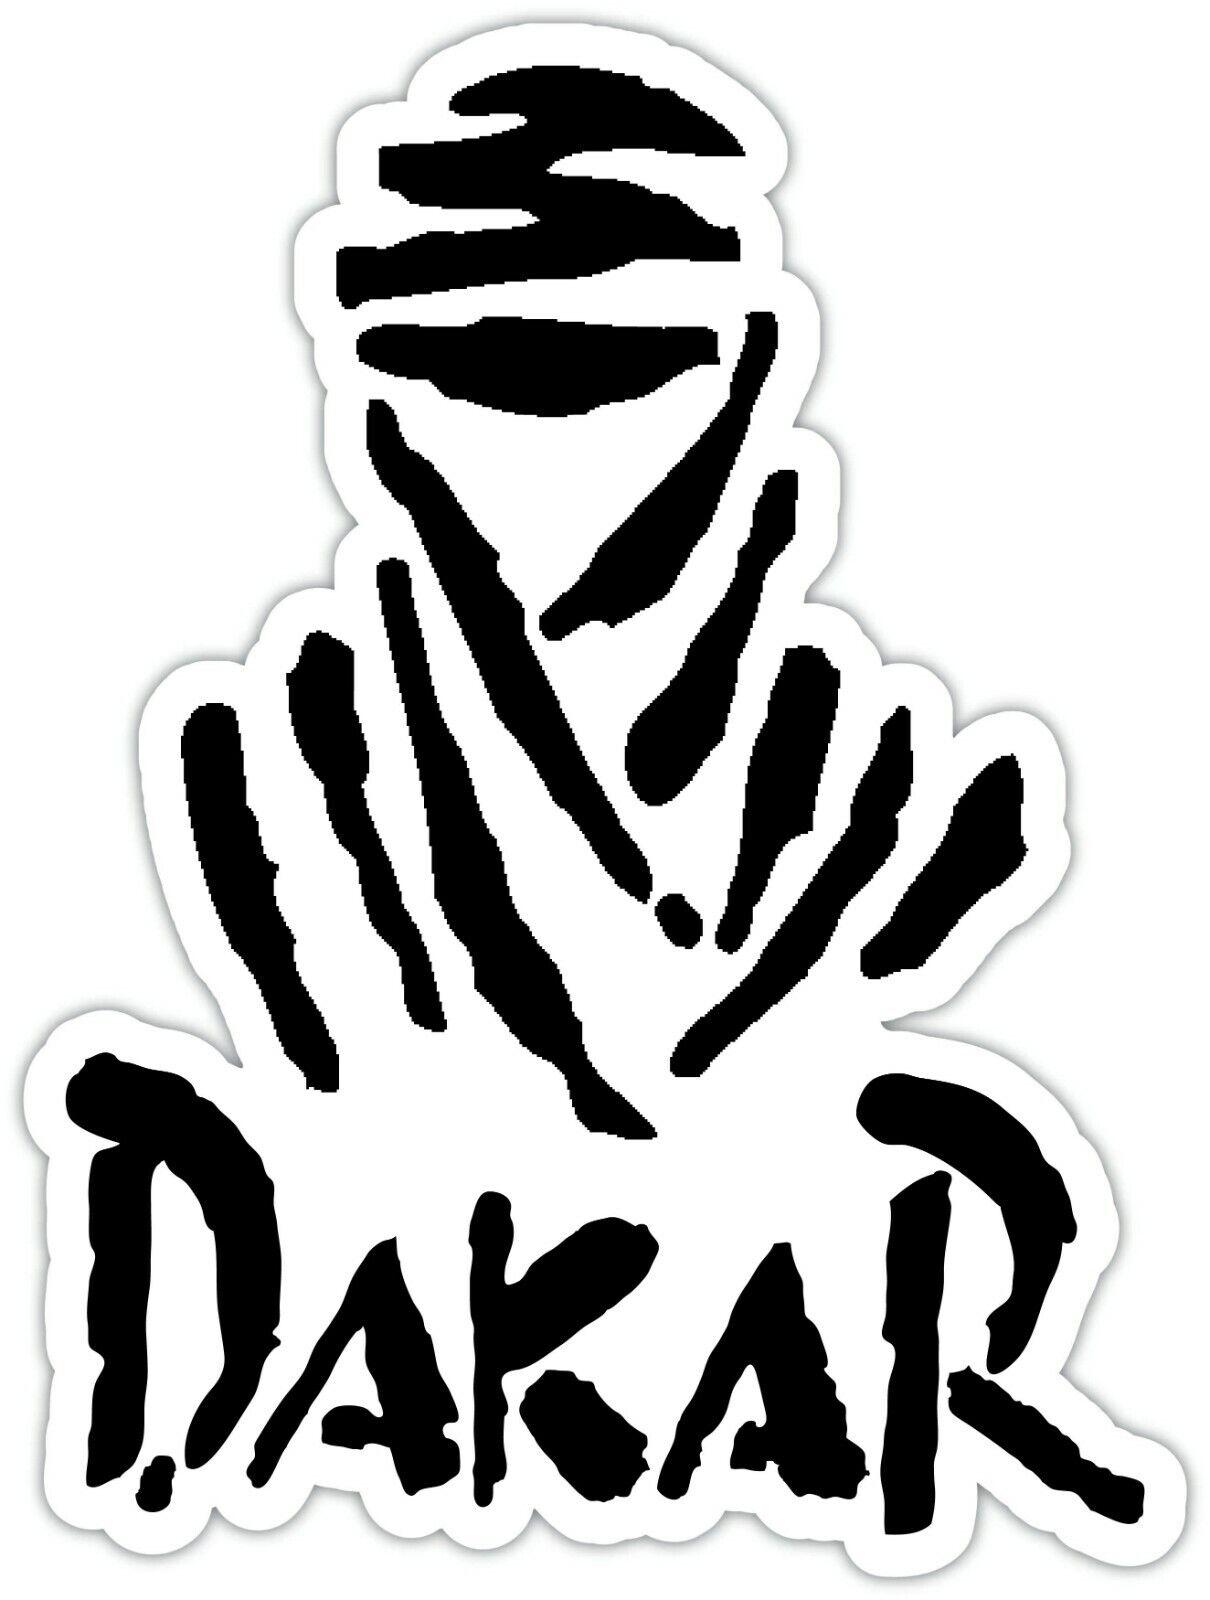 Home Decoration - Dakar Race Rally Truck Motorcycle Vinyl Sticker Decal Car Laptop Bumper